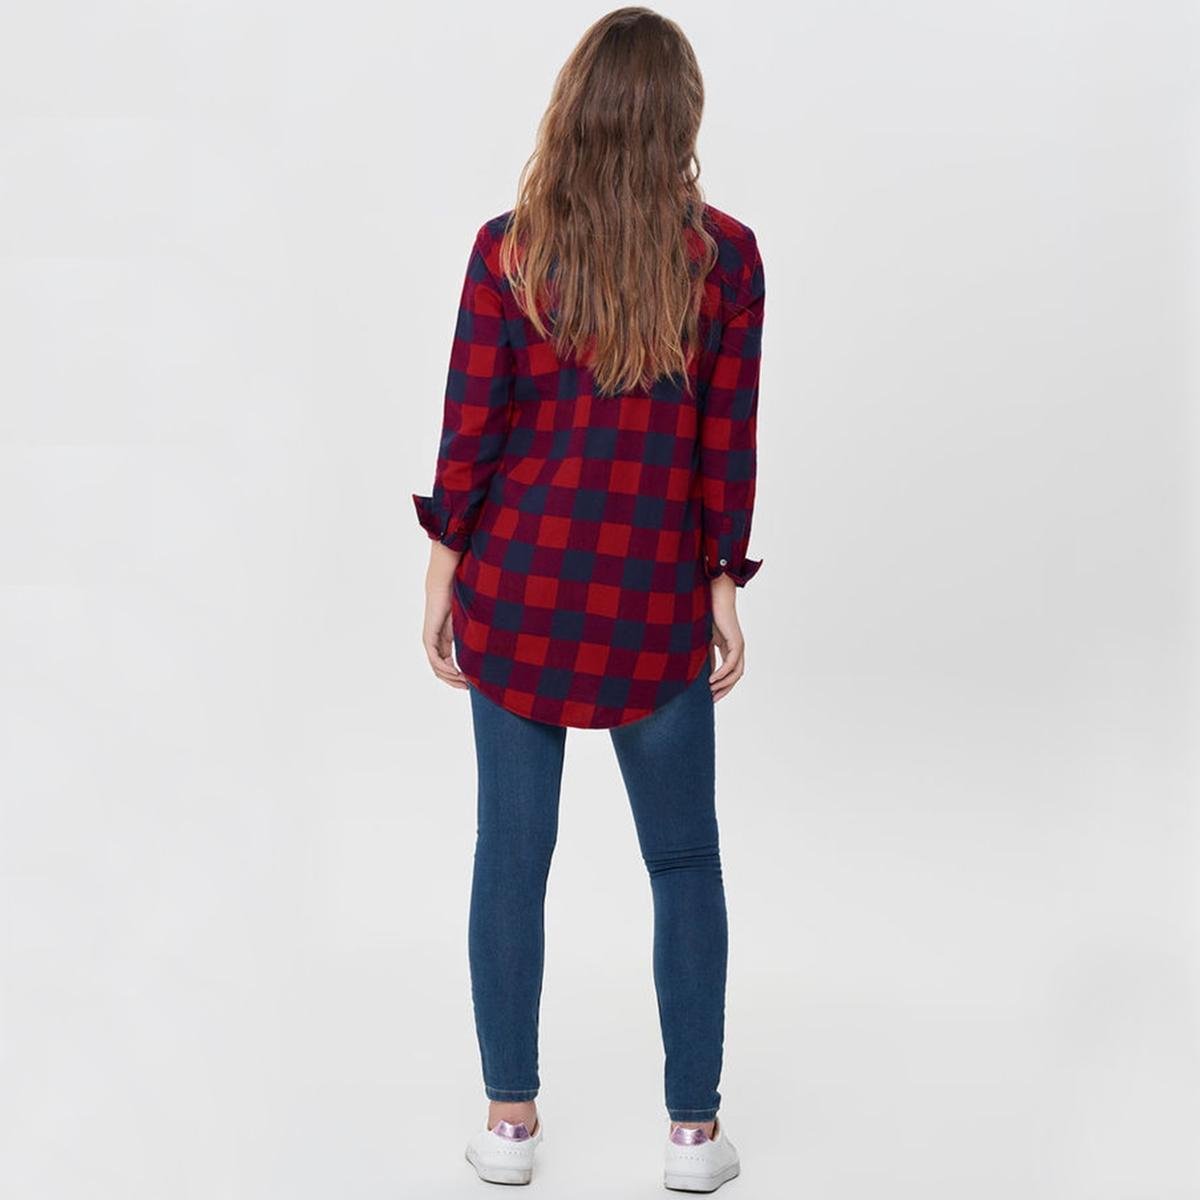 Рубашка в клетку с длинными рукавами рубашка в клетку rip curl faded check shirt indian teal